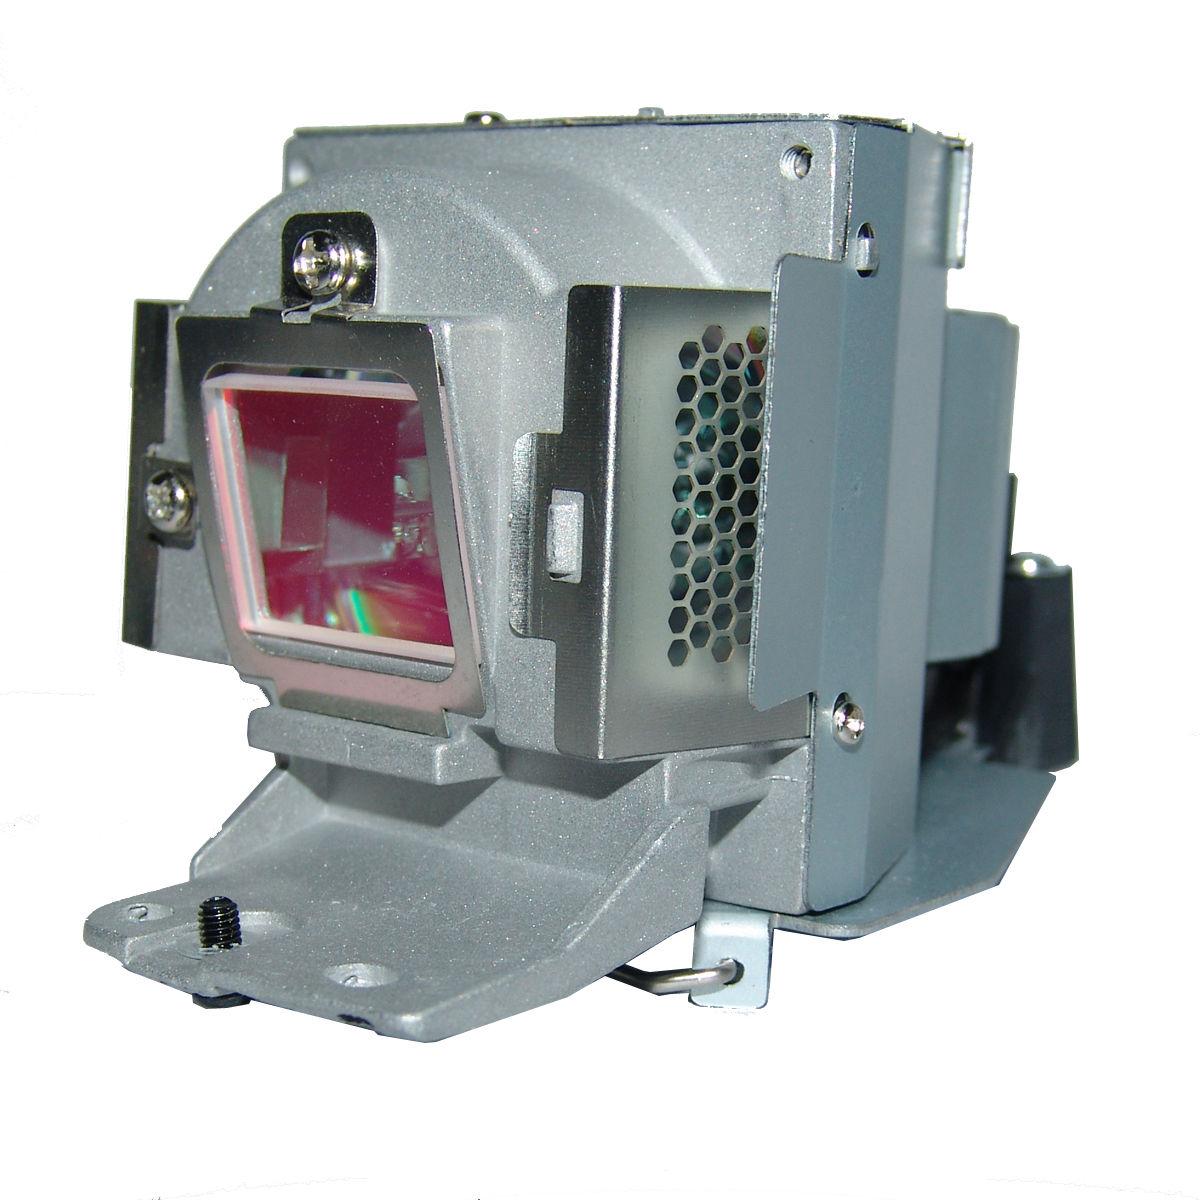 Projector Lamp Bulb VLT-EX240LP for Mitsubishi EX200U EX240U EX270U EW270U ES200U EW230U-ST EX240LP EX230U GW-375 With Housing